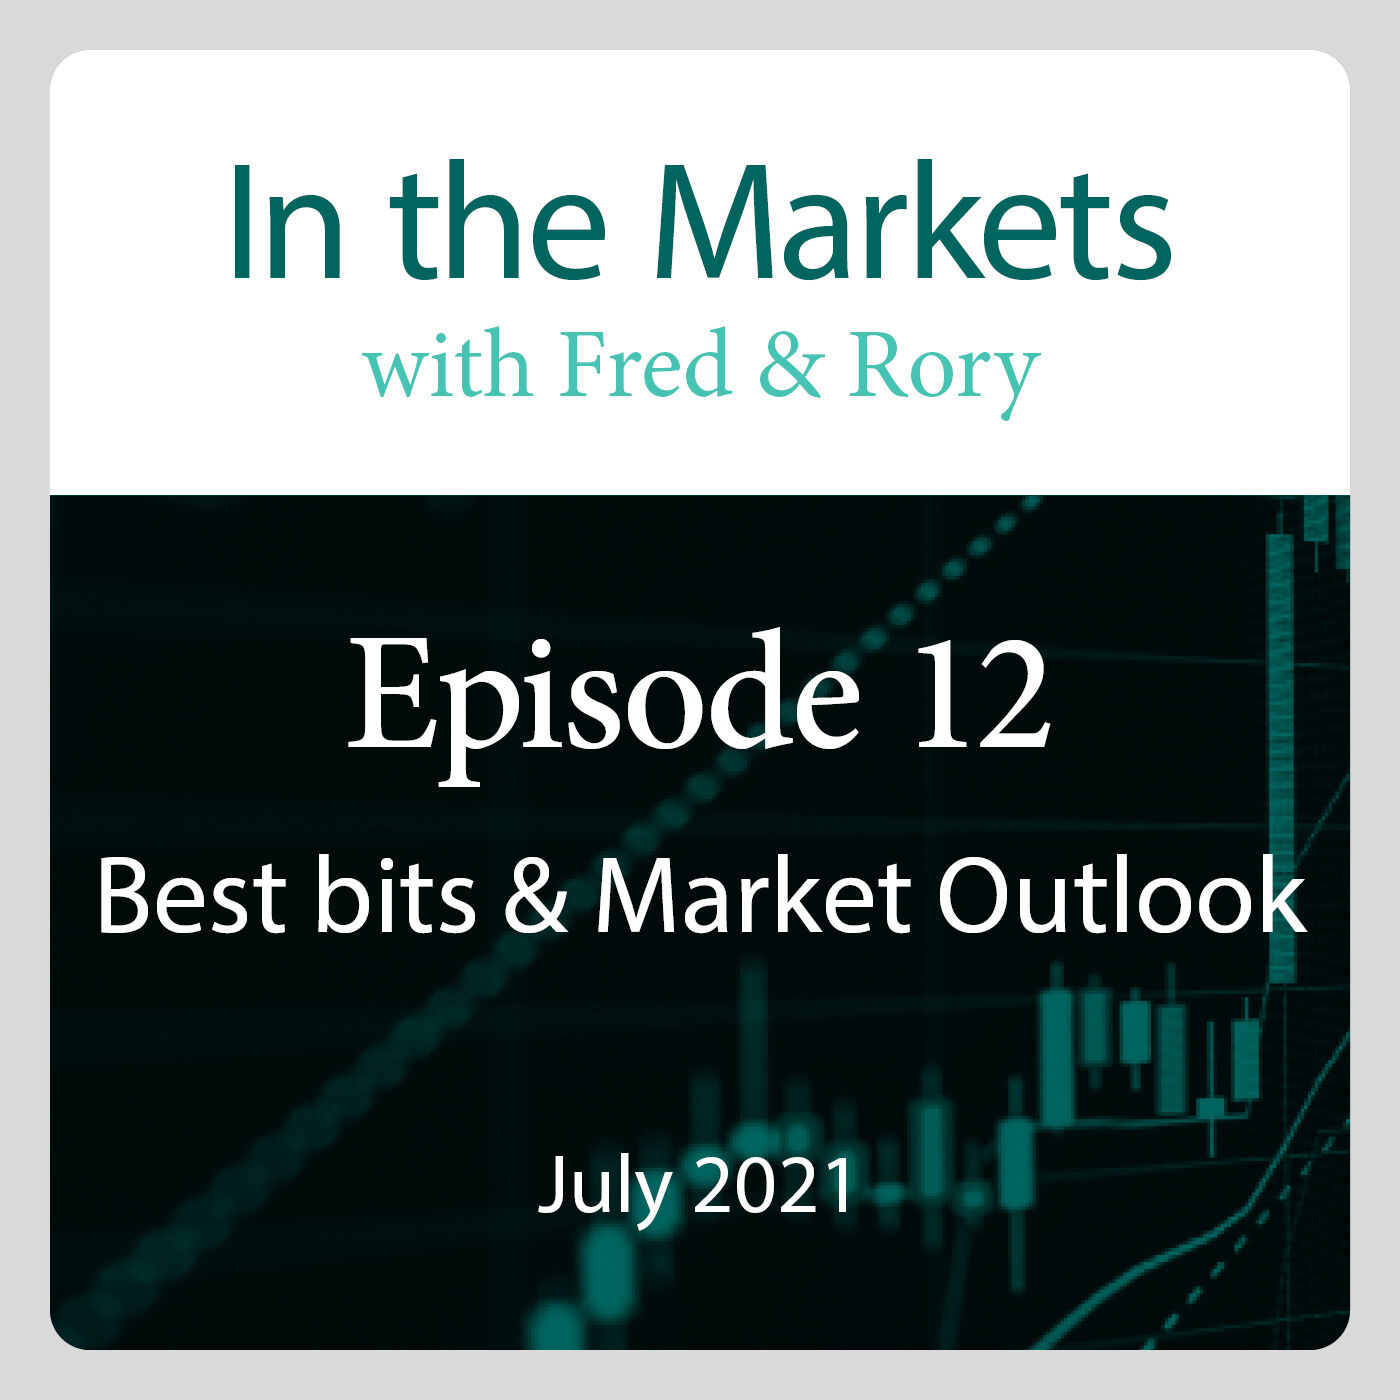 July 2021: Best bits & Market Outlook